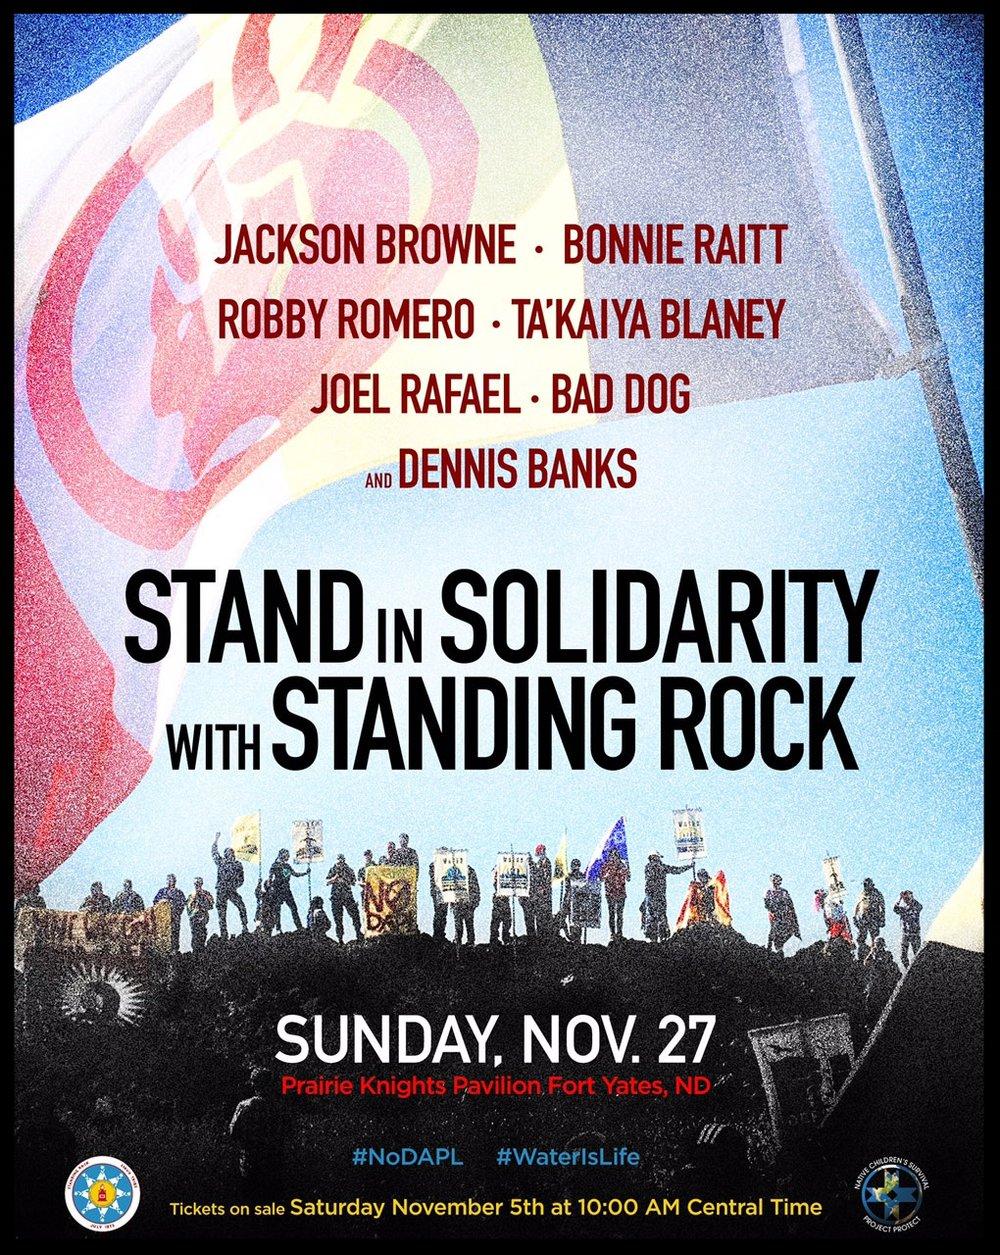 Robby Romero Standing-Rock-Concert-Series-Posters.jpg